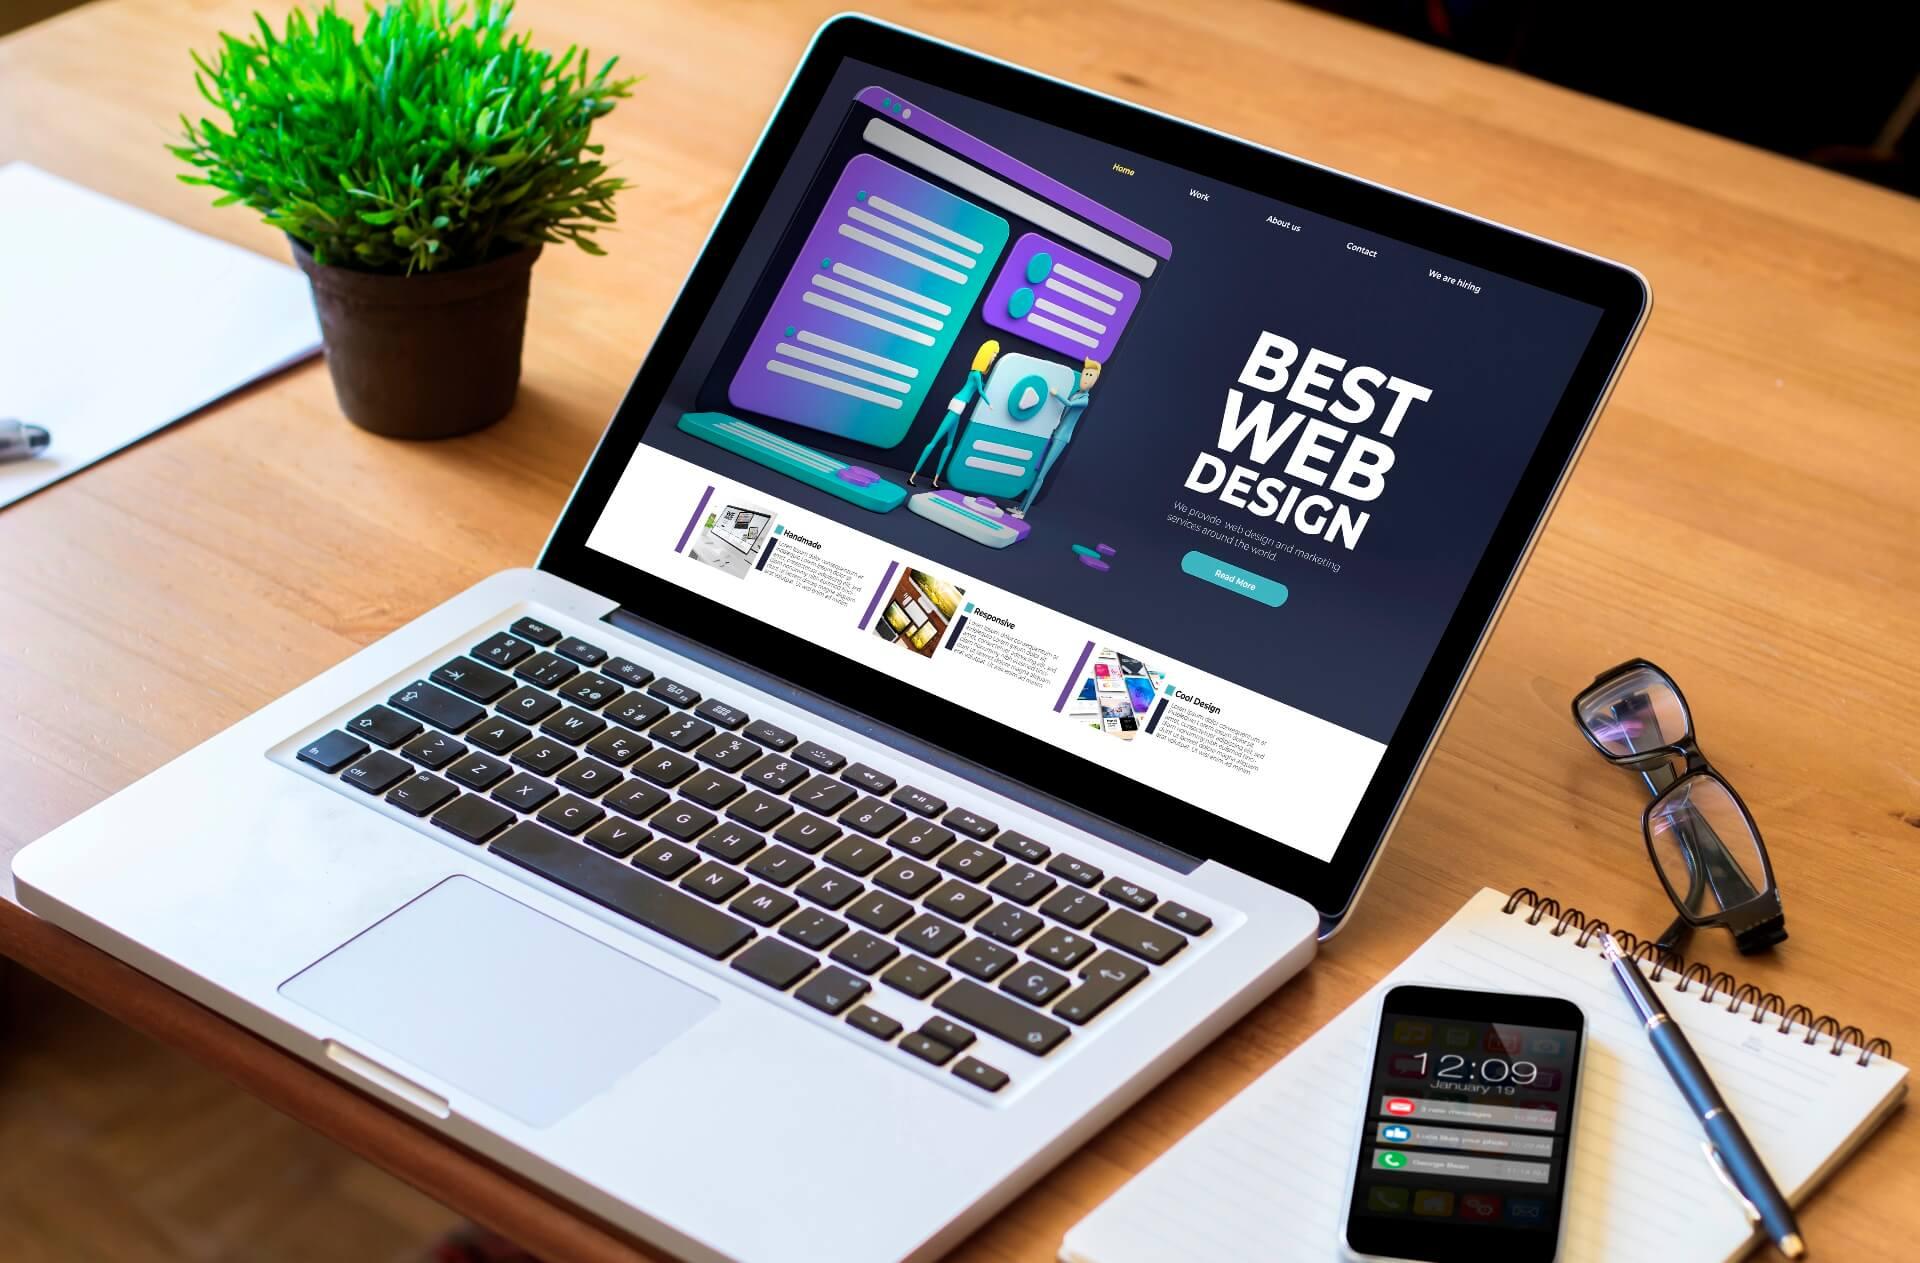 Generic webpage on a laptop screen